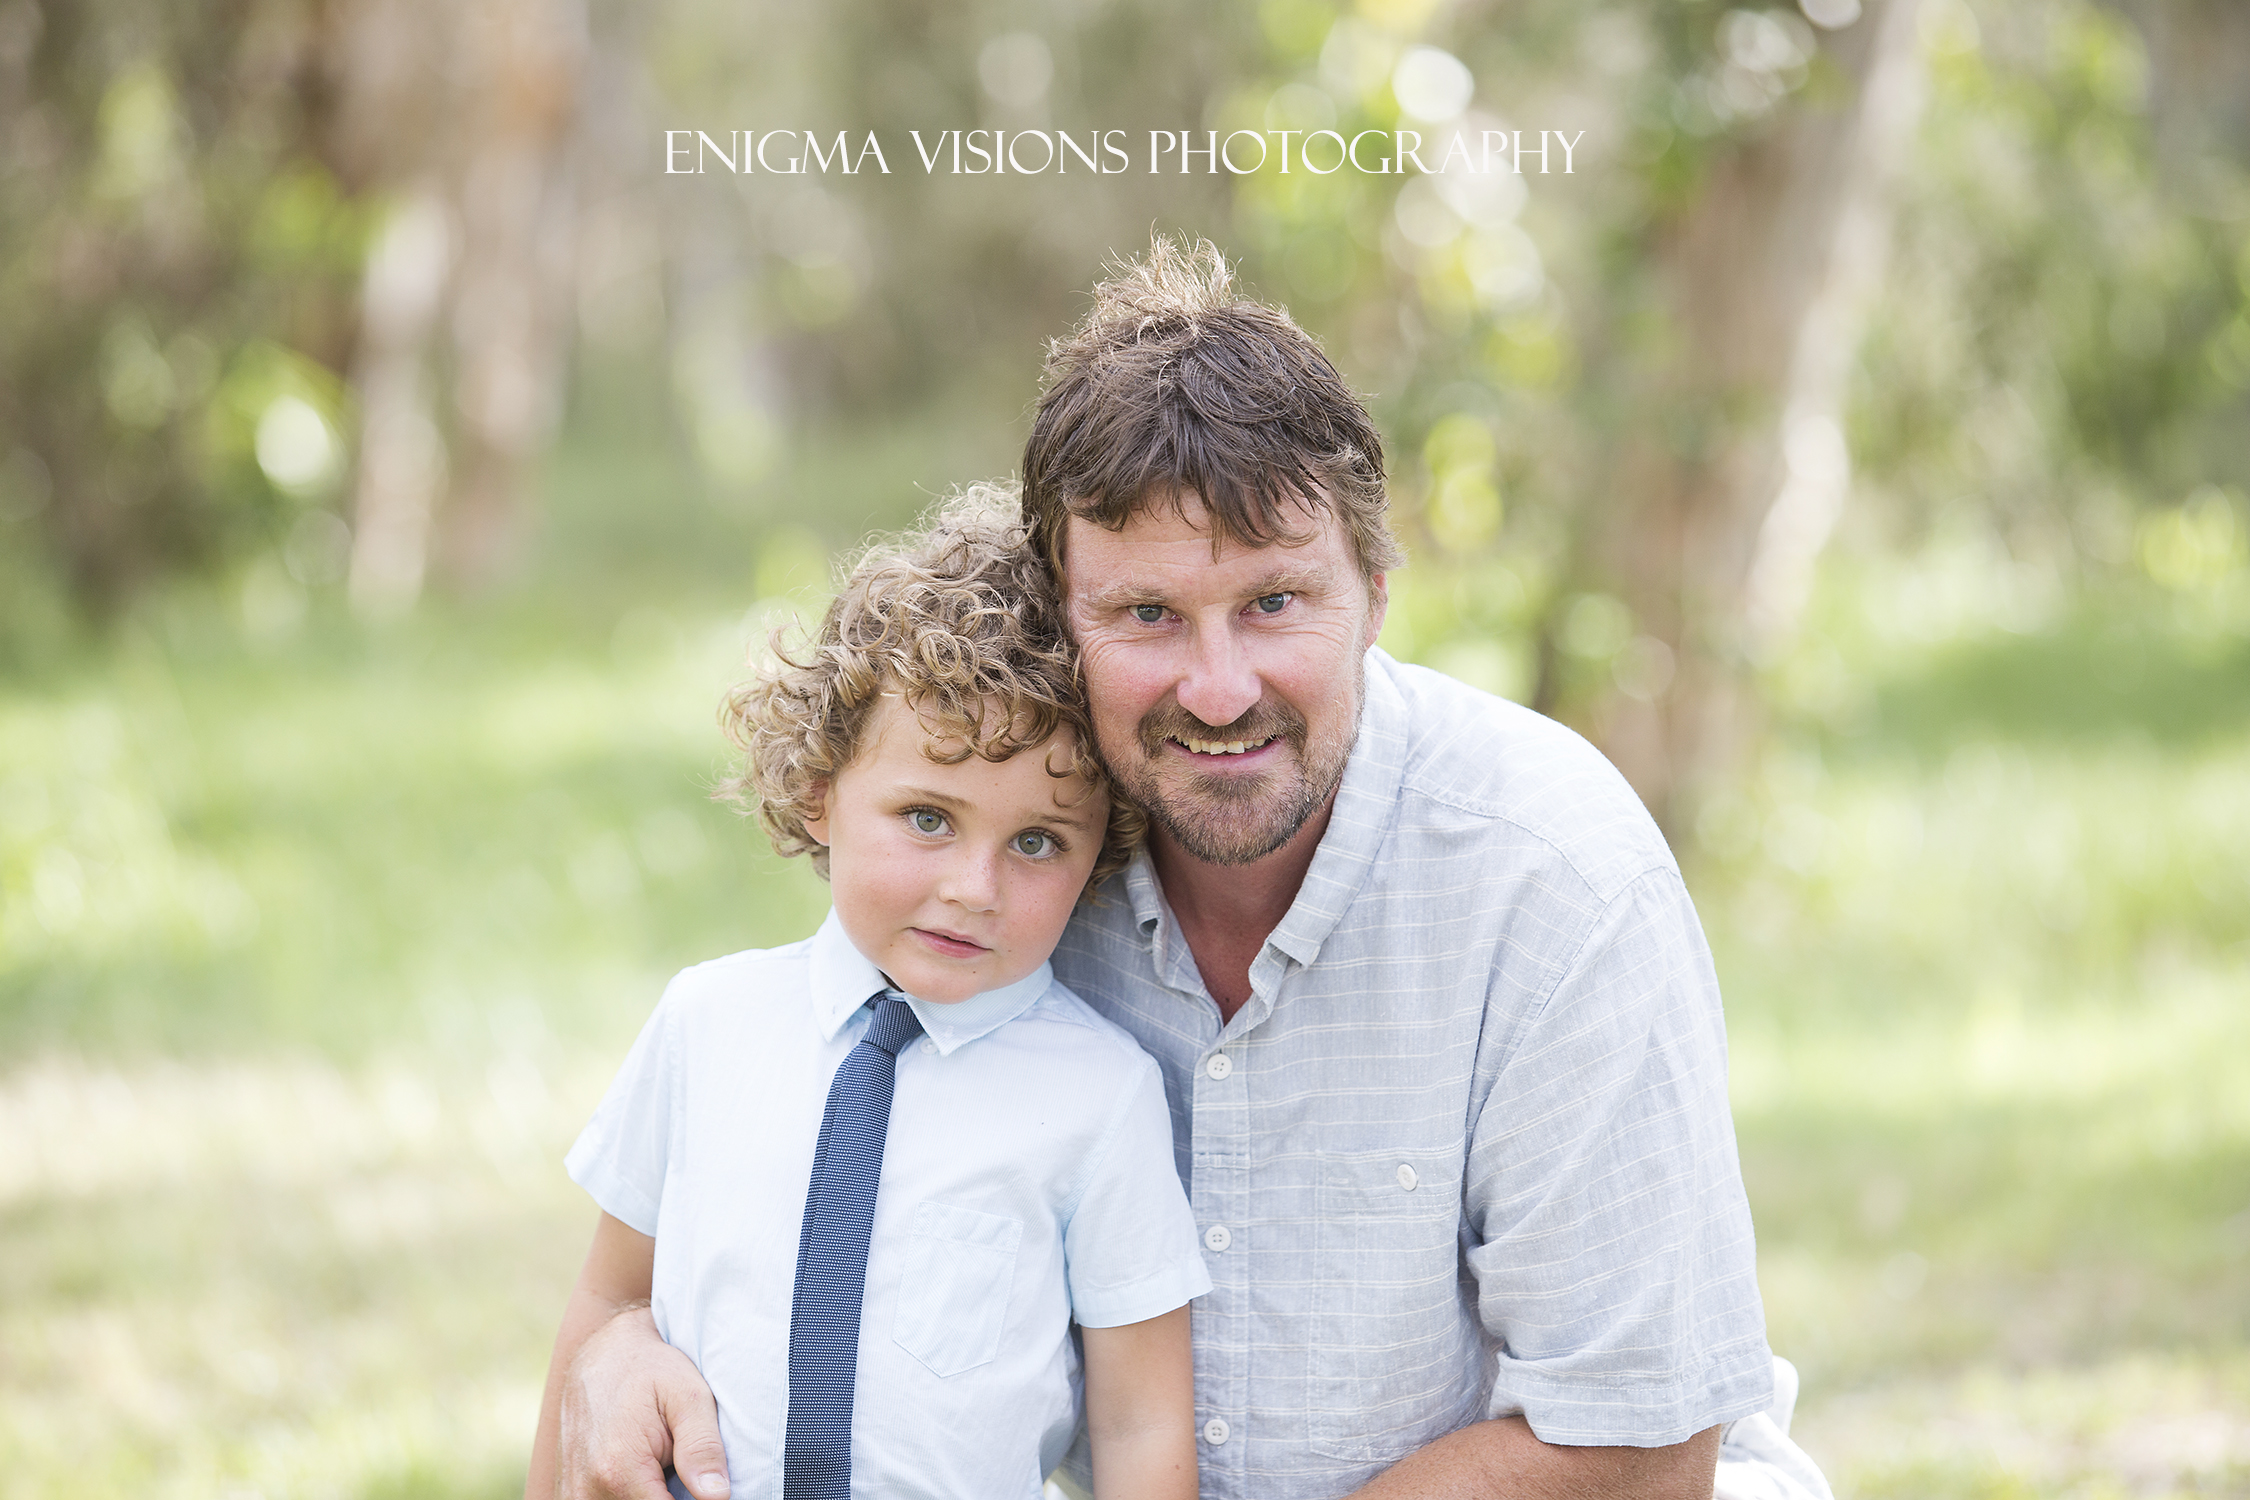 EnigmaVisionsPhotography_FAMILY_Henschke (11).jpg